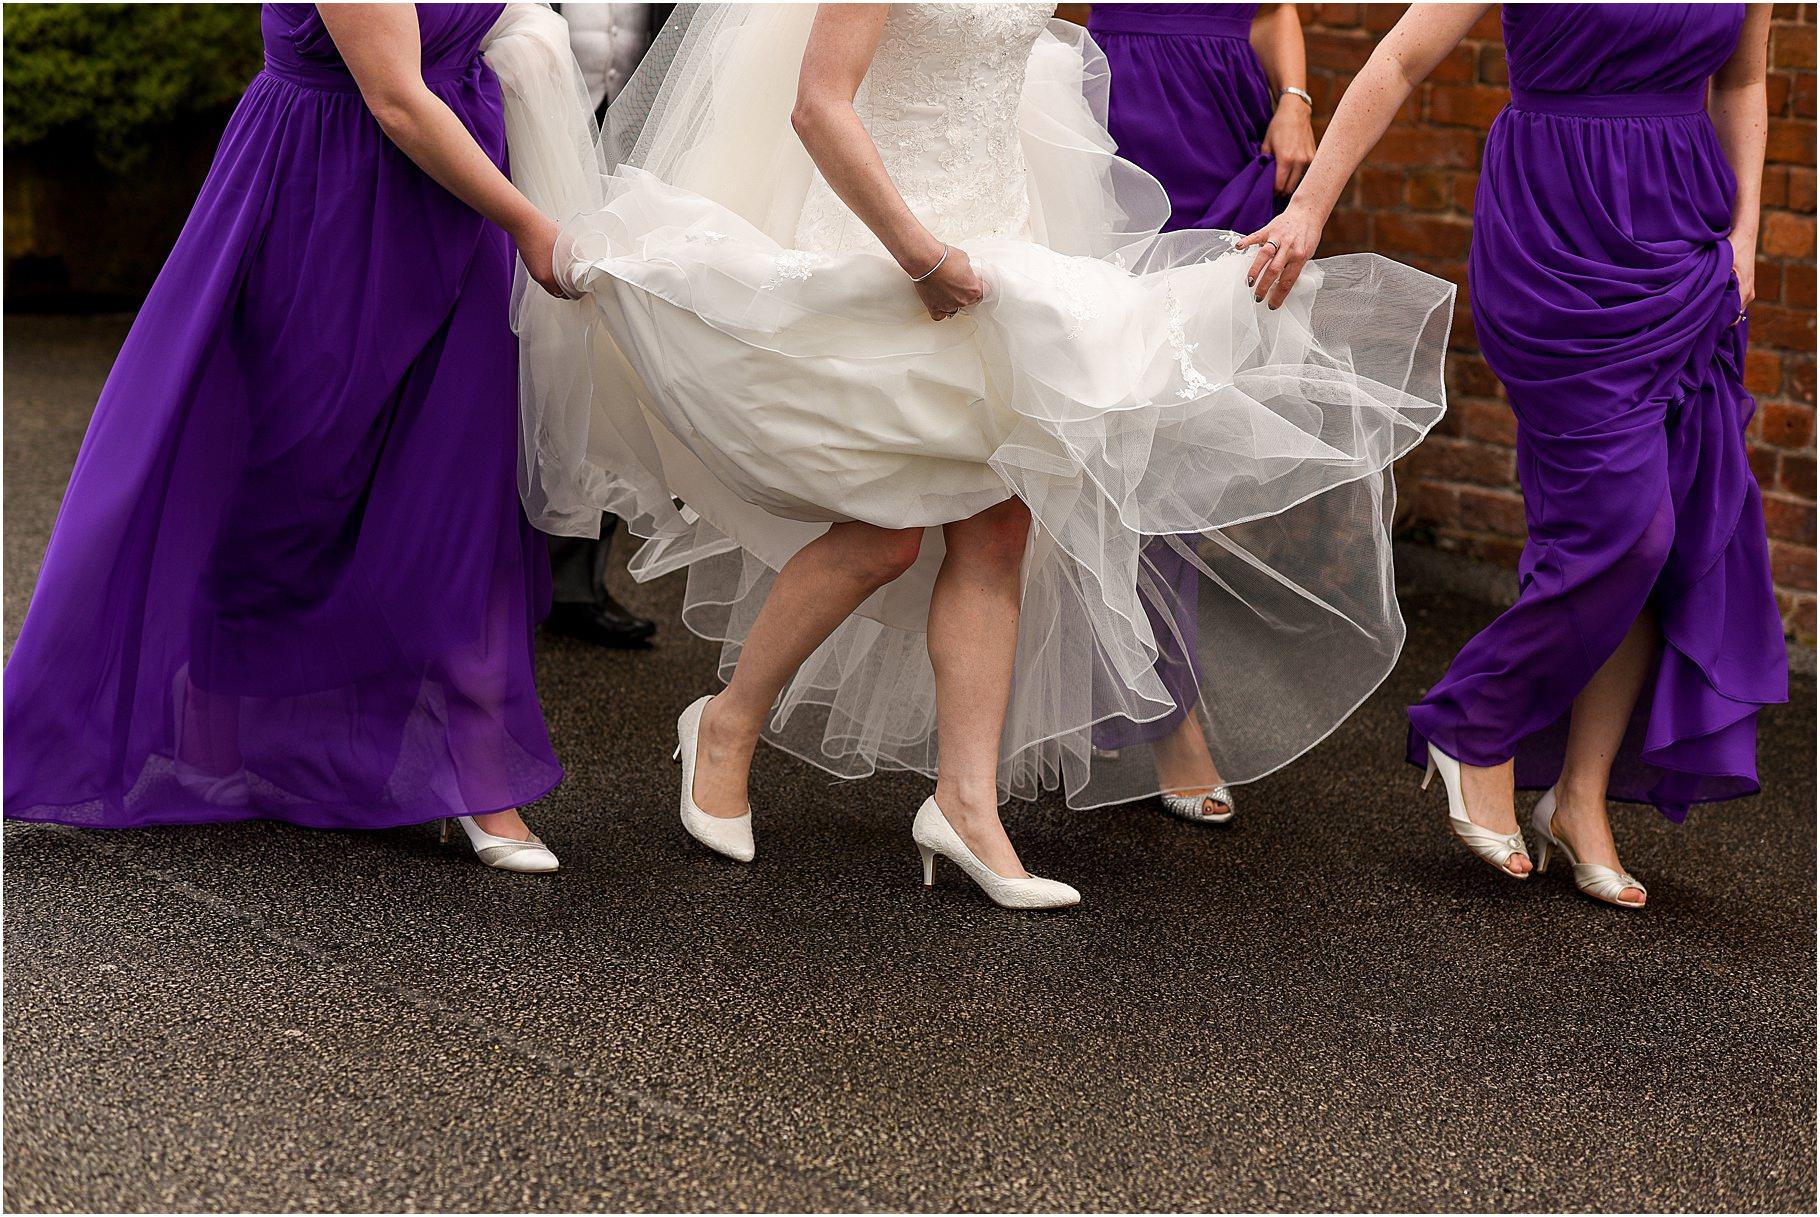 dan-wootton-photography-2017-weddings-138.jpg